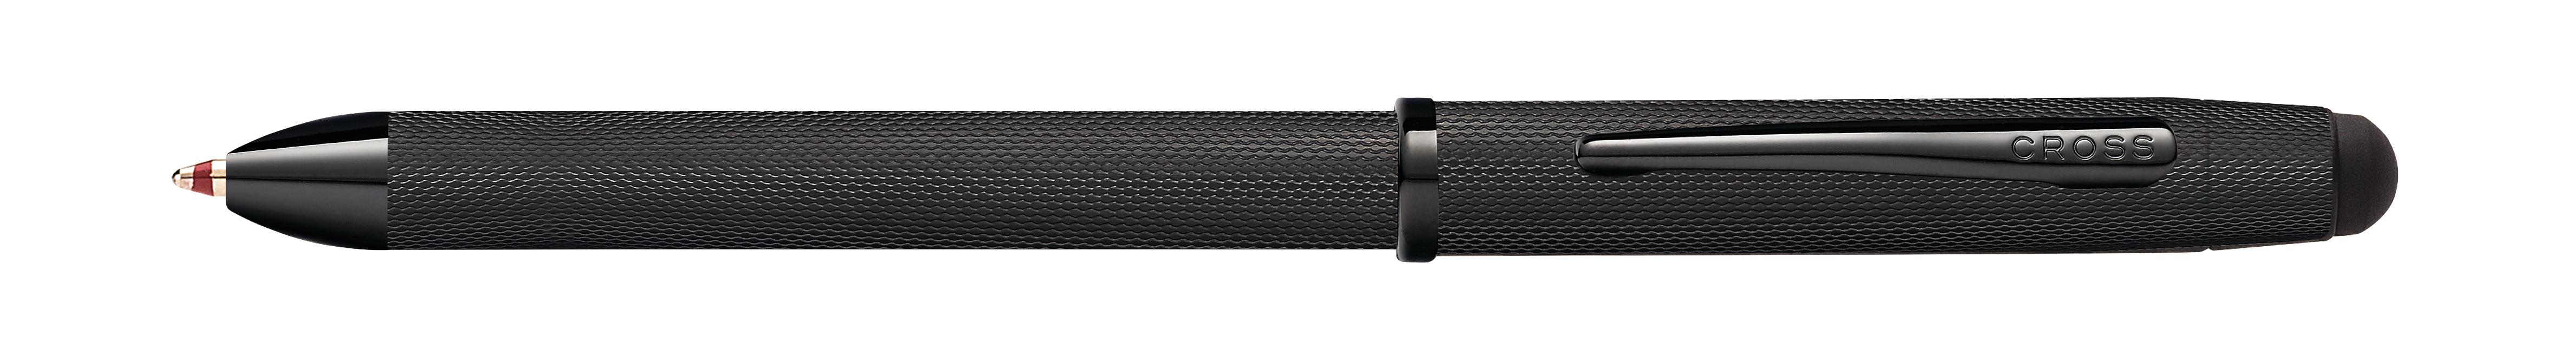 Tech3+ Brushed Black PVD Multifunction Pen